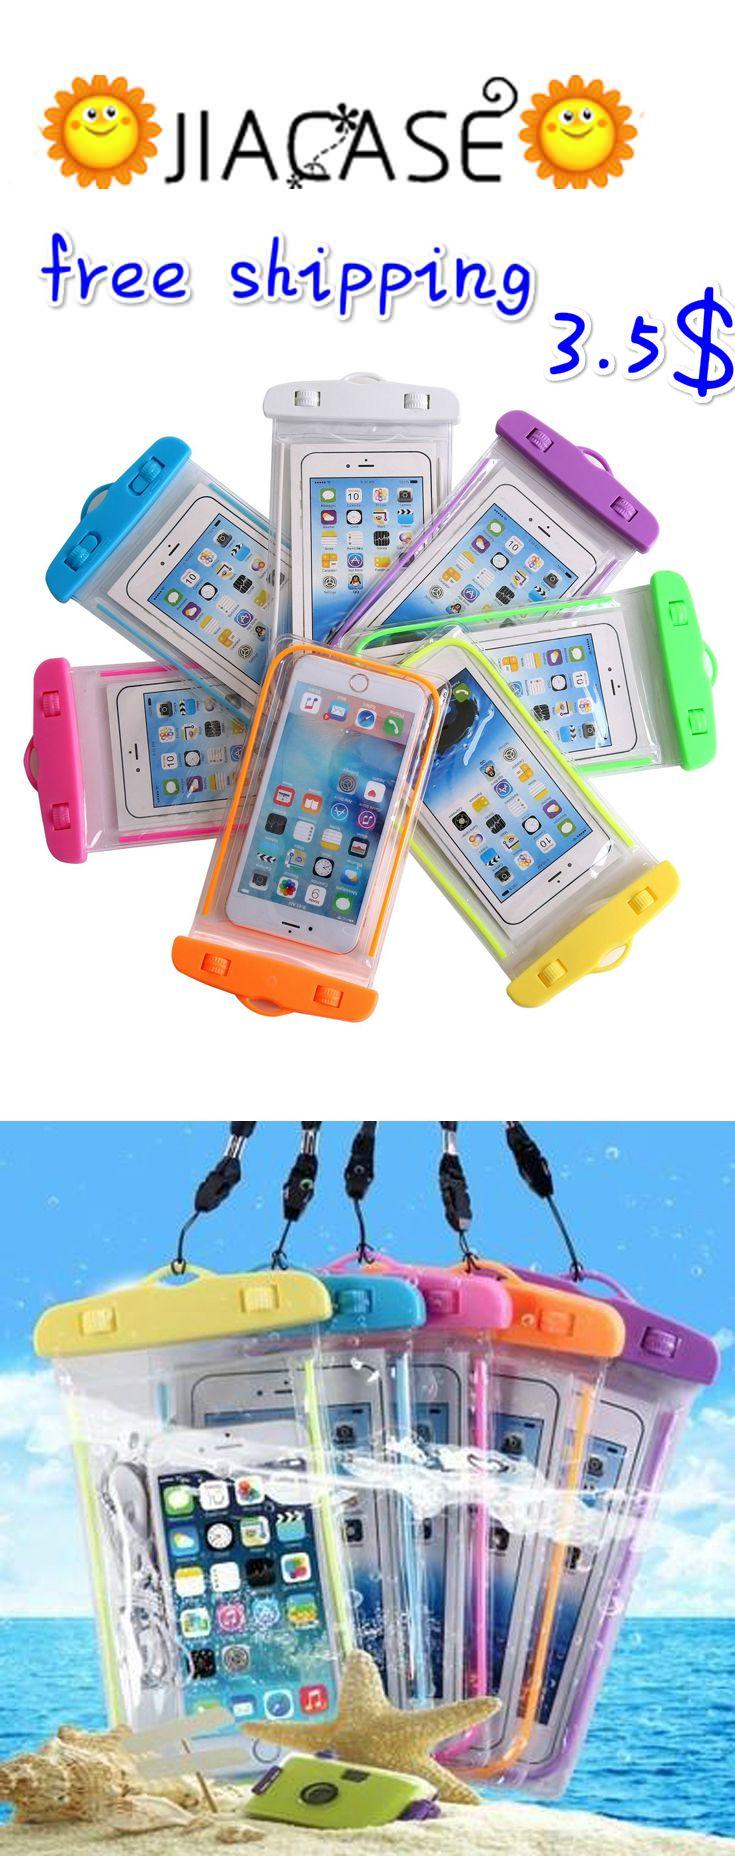 Wetsuit Iphone 5s 5 Waterproof Rugged Case